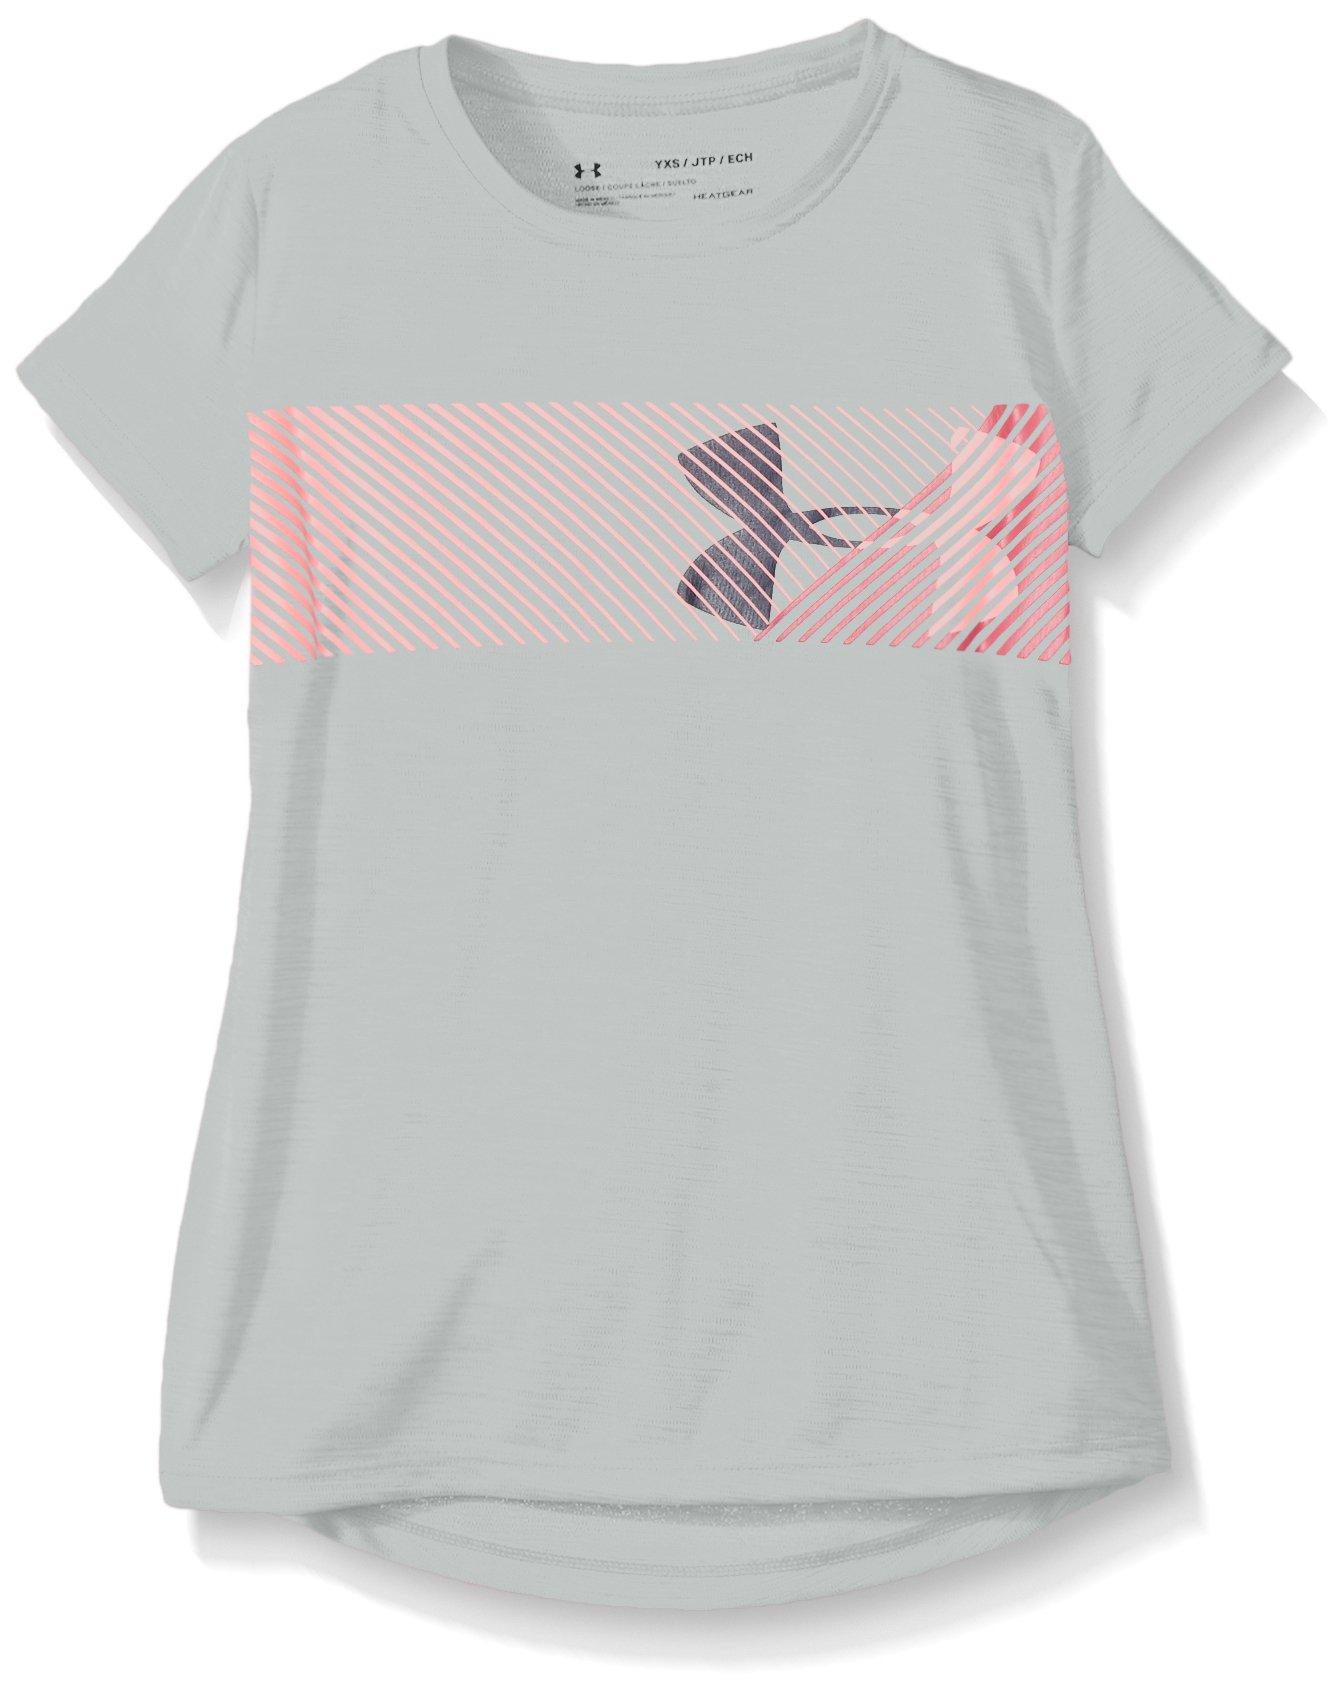 Under Armour Girls Hybrid Big Logo Tee, Overcast Grey/Coral, Large / 14-16 Big Kids